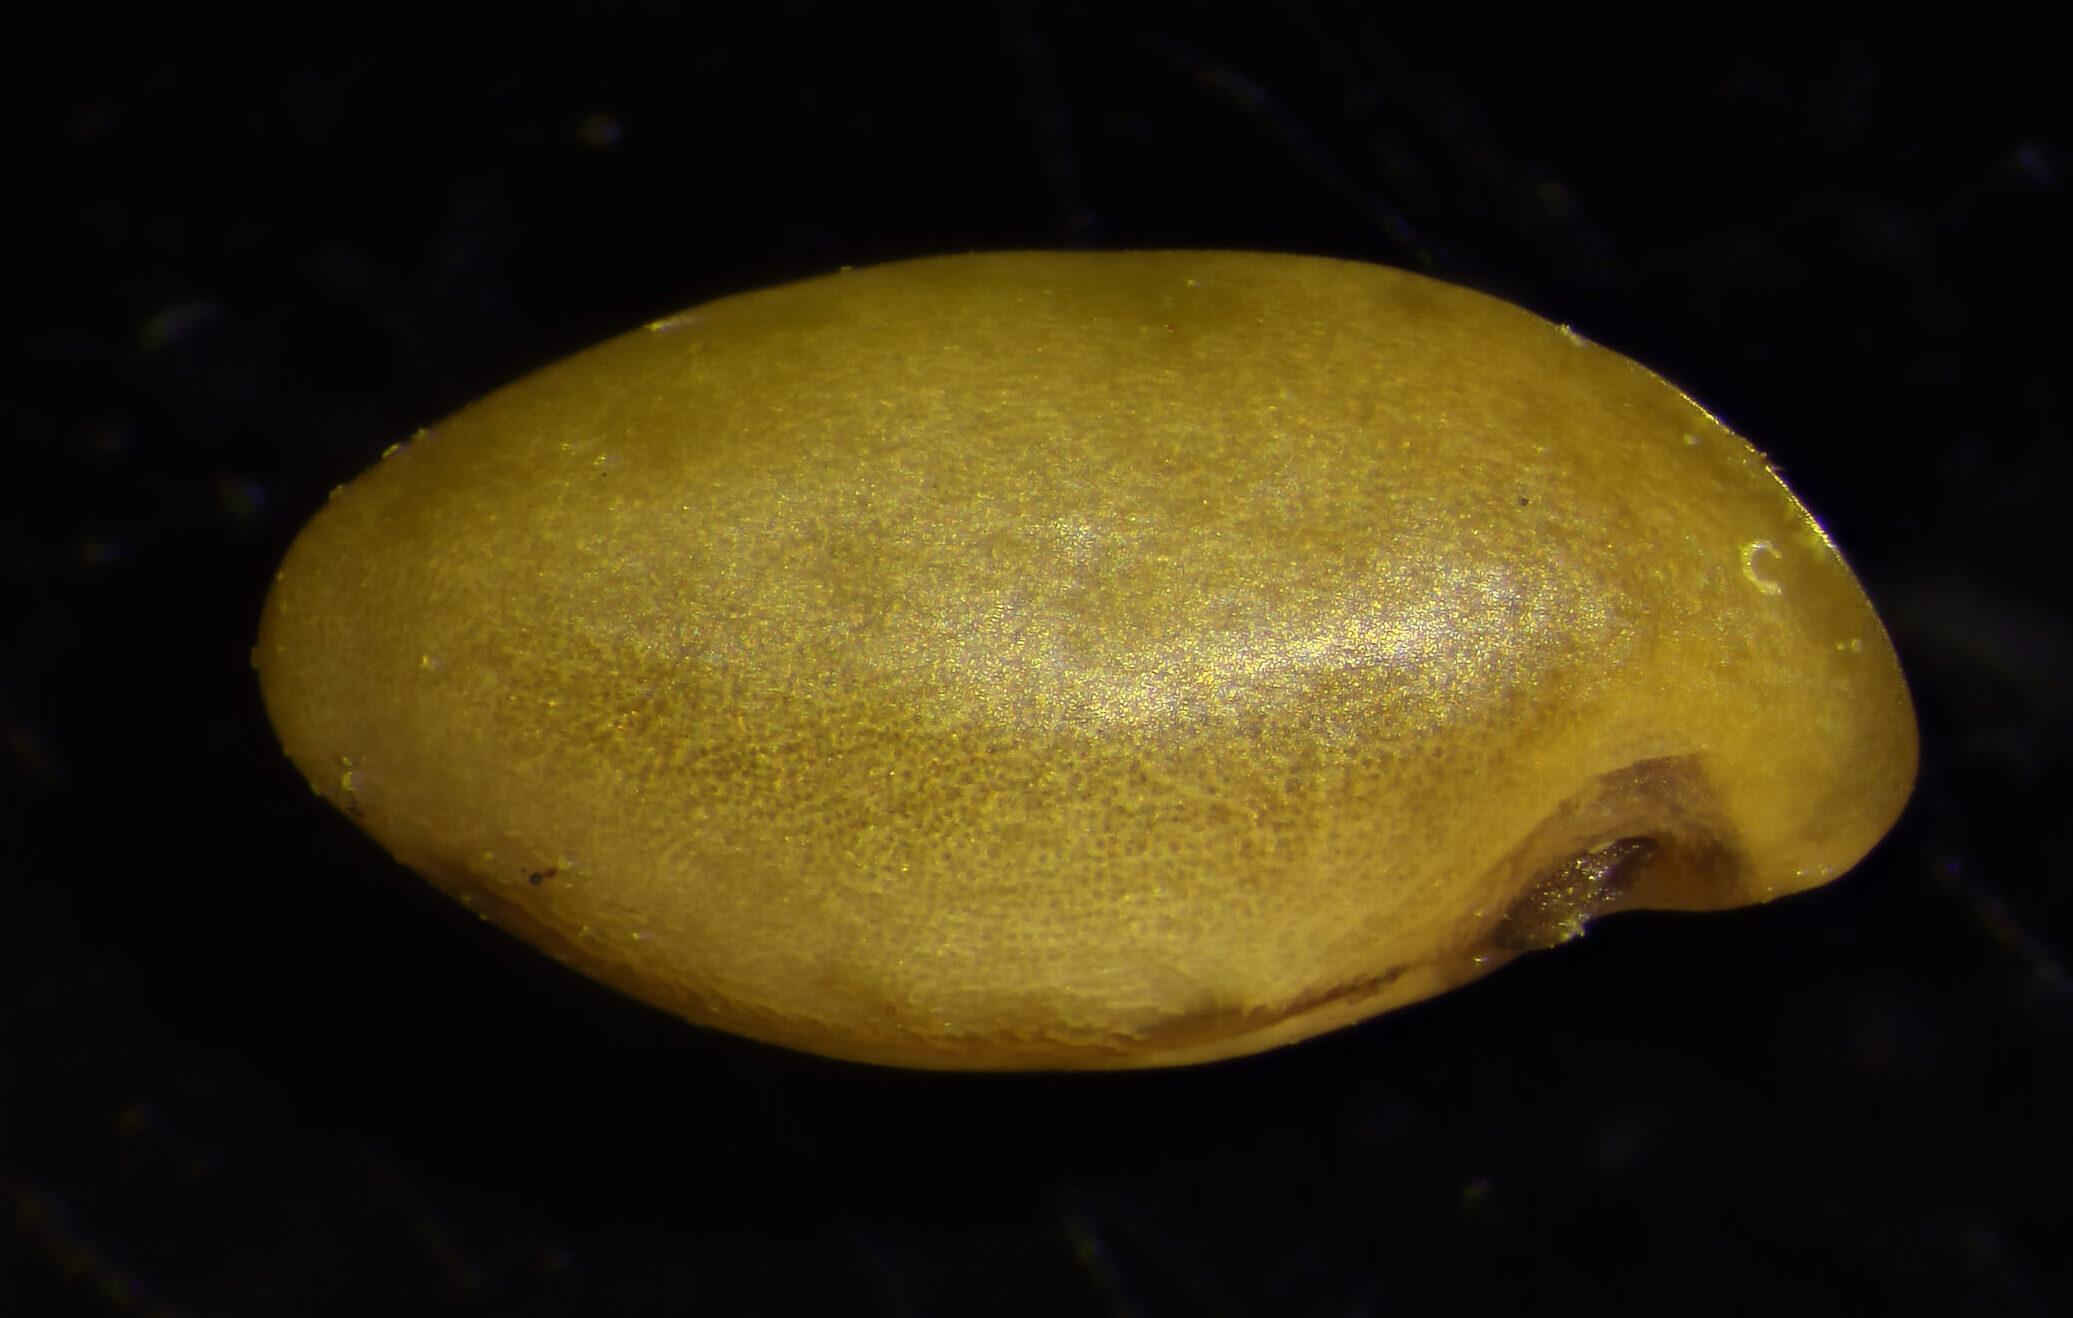 Image of Amorpha herbacea var. crenulata seed.